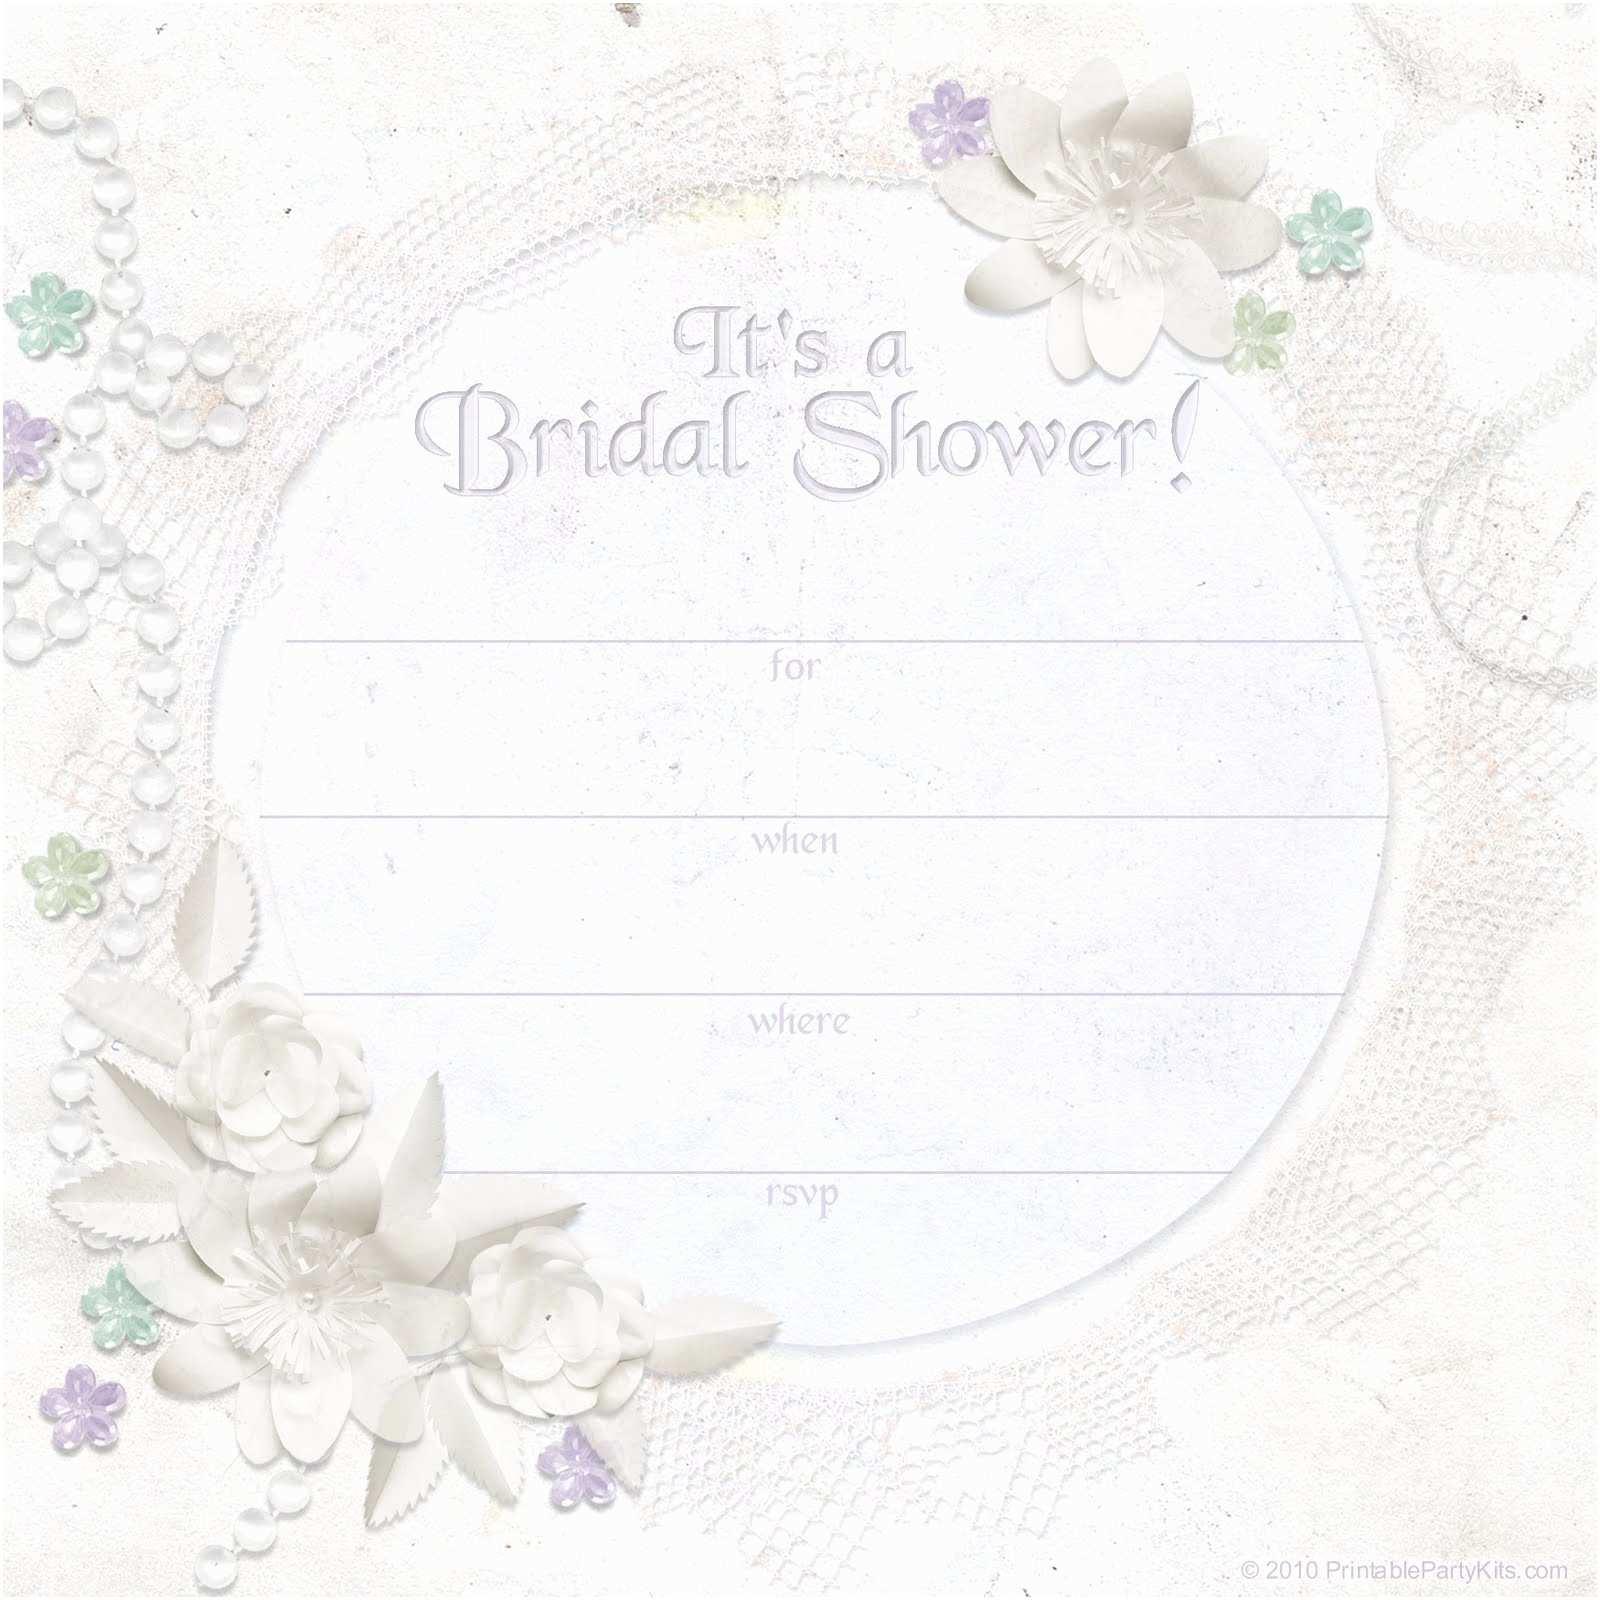 Free Bridal Shower Invitations Bridal Shower Invitations Free Blank Printable Bridal